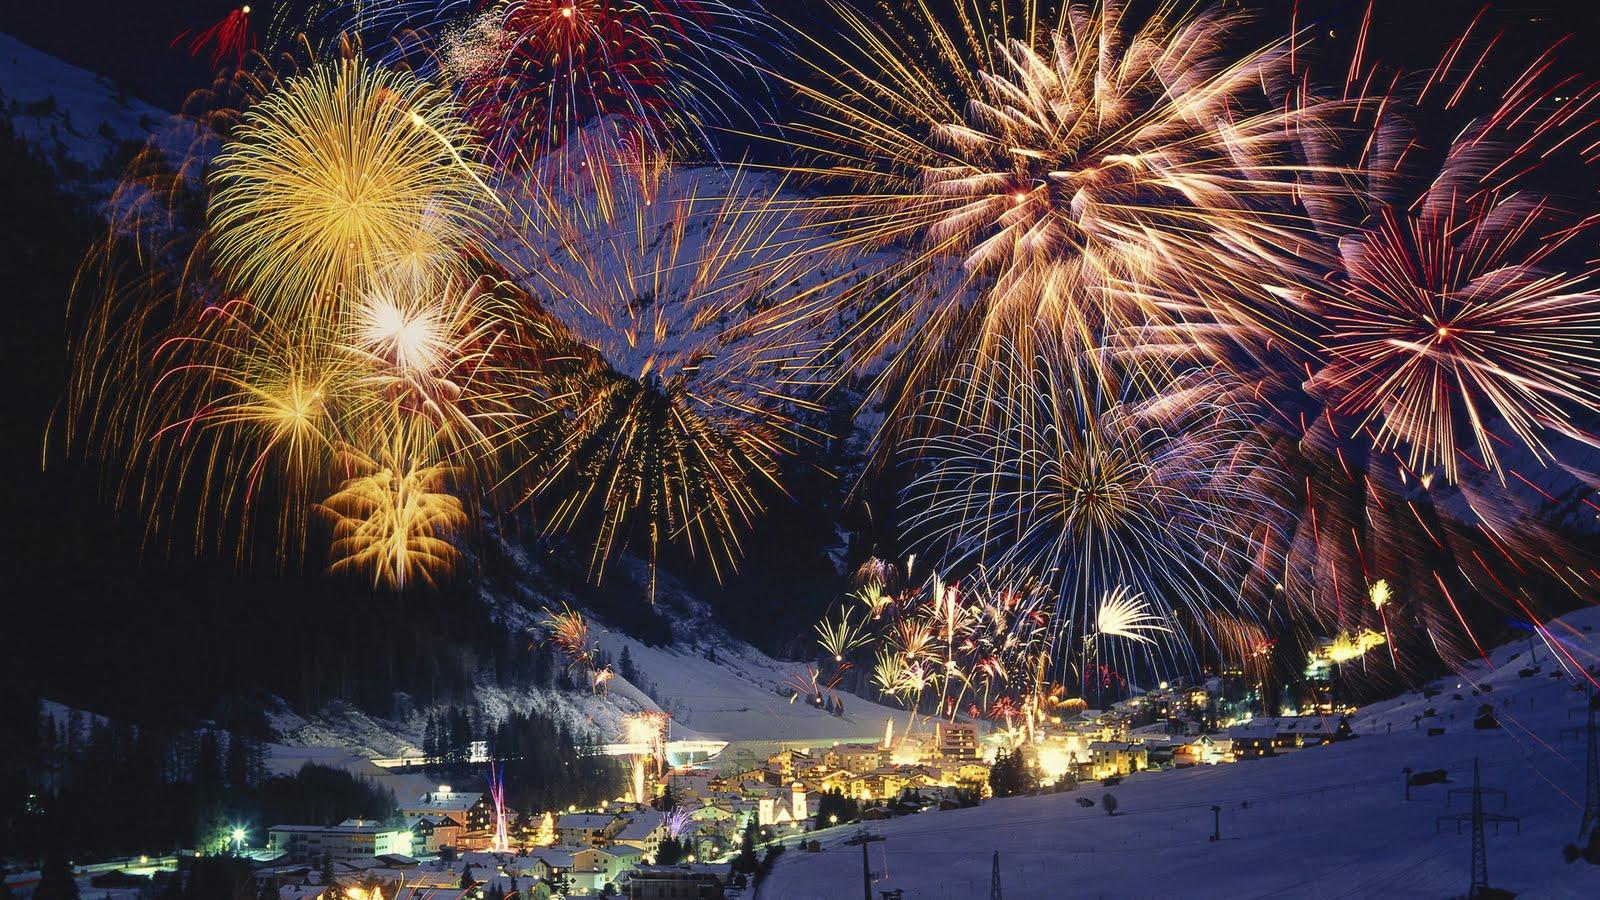 http://1.bp.blogspot.com/-WsPBK1nXszY/Tm7BmI7OuGI/AAAAAAAAAS4/gisSWnbpi3o/s1600/New_Years_Celebration_St_Anton_Am_Arlberg_Tyrol_Austria.jpg